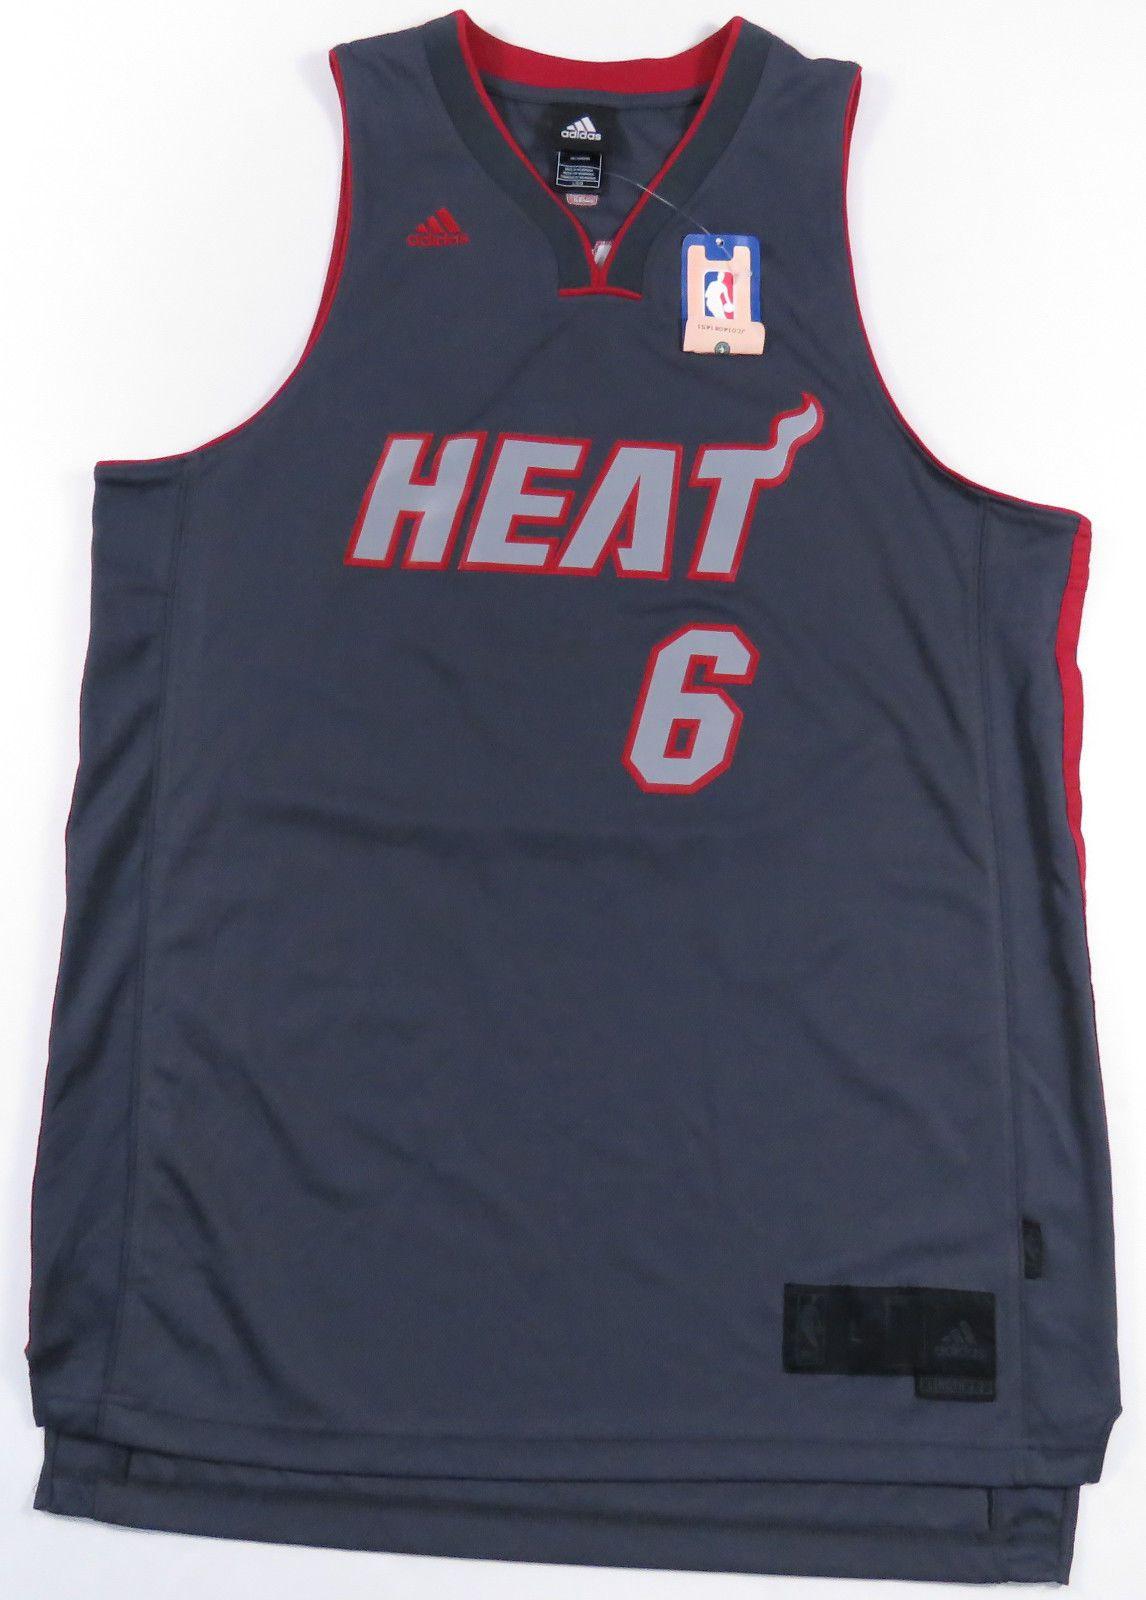 722764edede2 LEBRON JAMES MIAMI HEAT ADIDAS SEWN GREY BASKETBALL JERSEY NBA MENS NEW NWT  L (eBay Link)